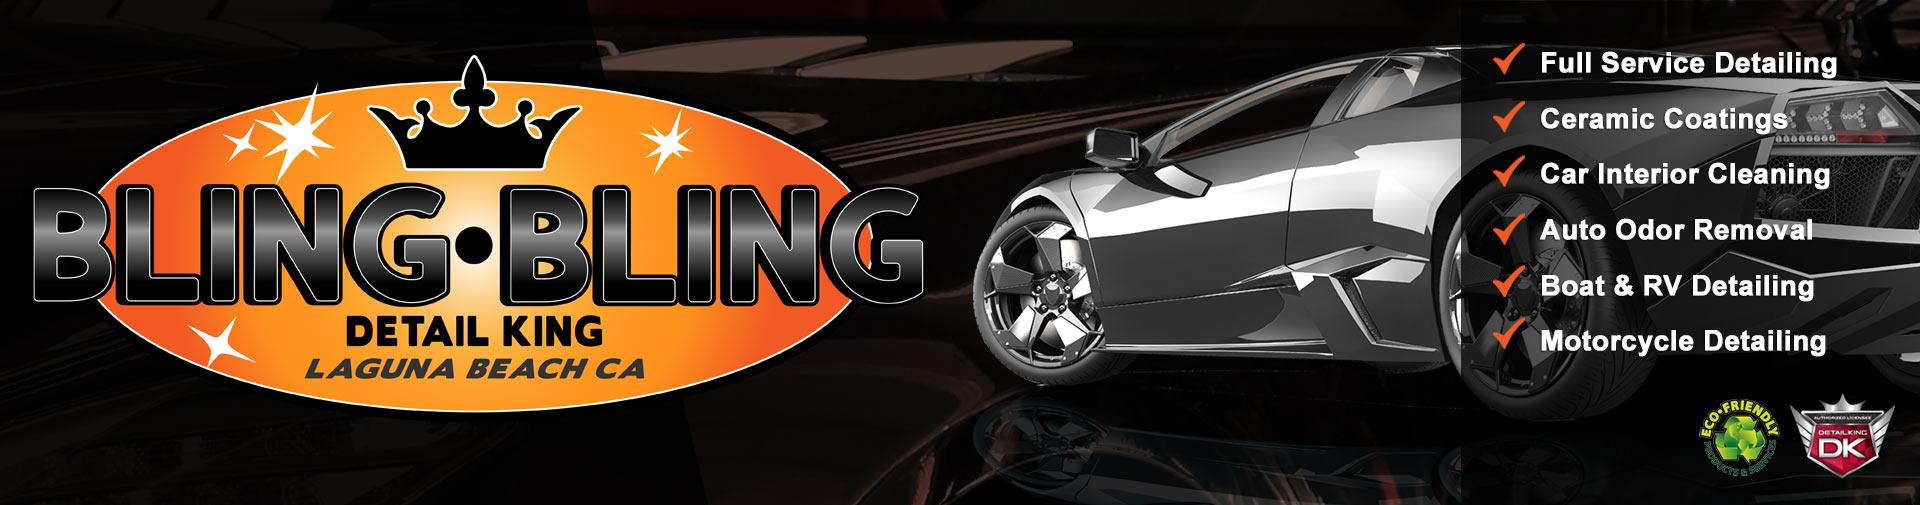 Bling Bling Detail King! Auto Detailing